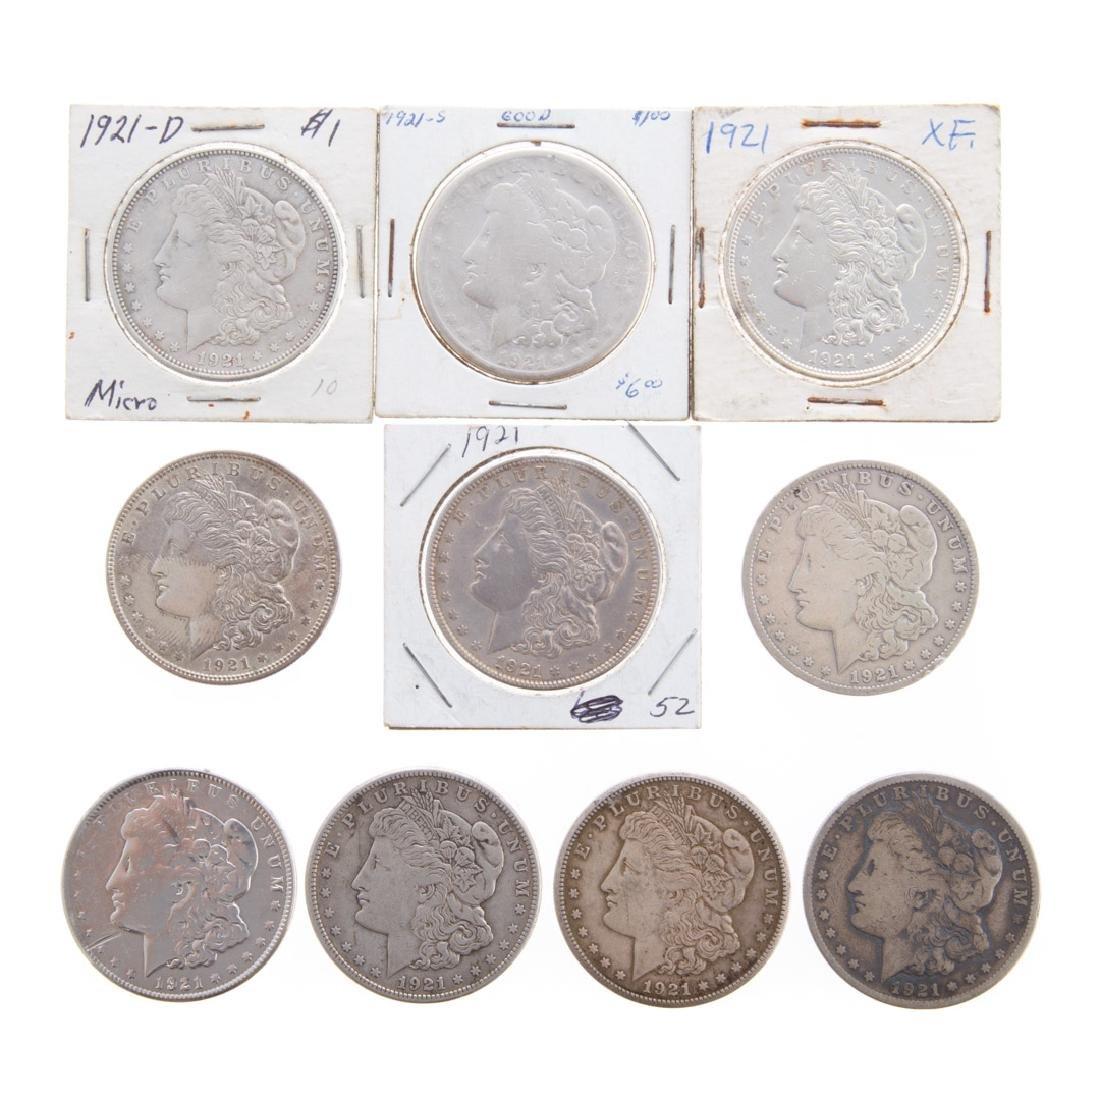 [US] Ten 1921 Morgan Dollars